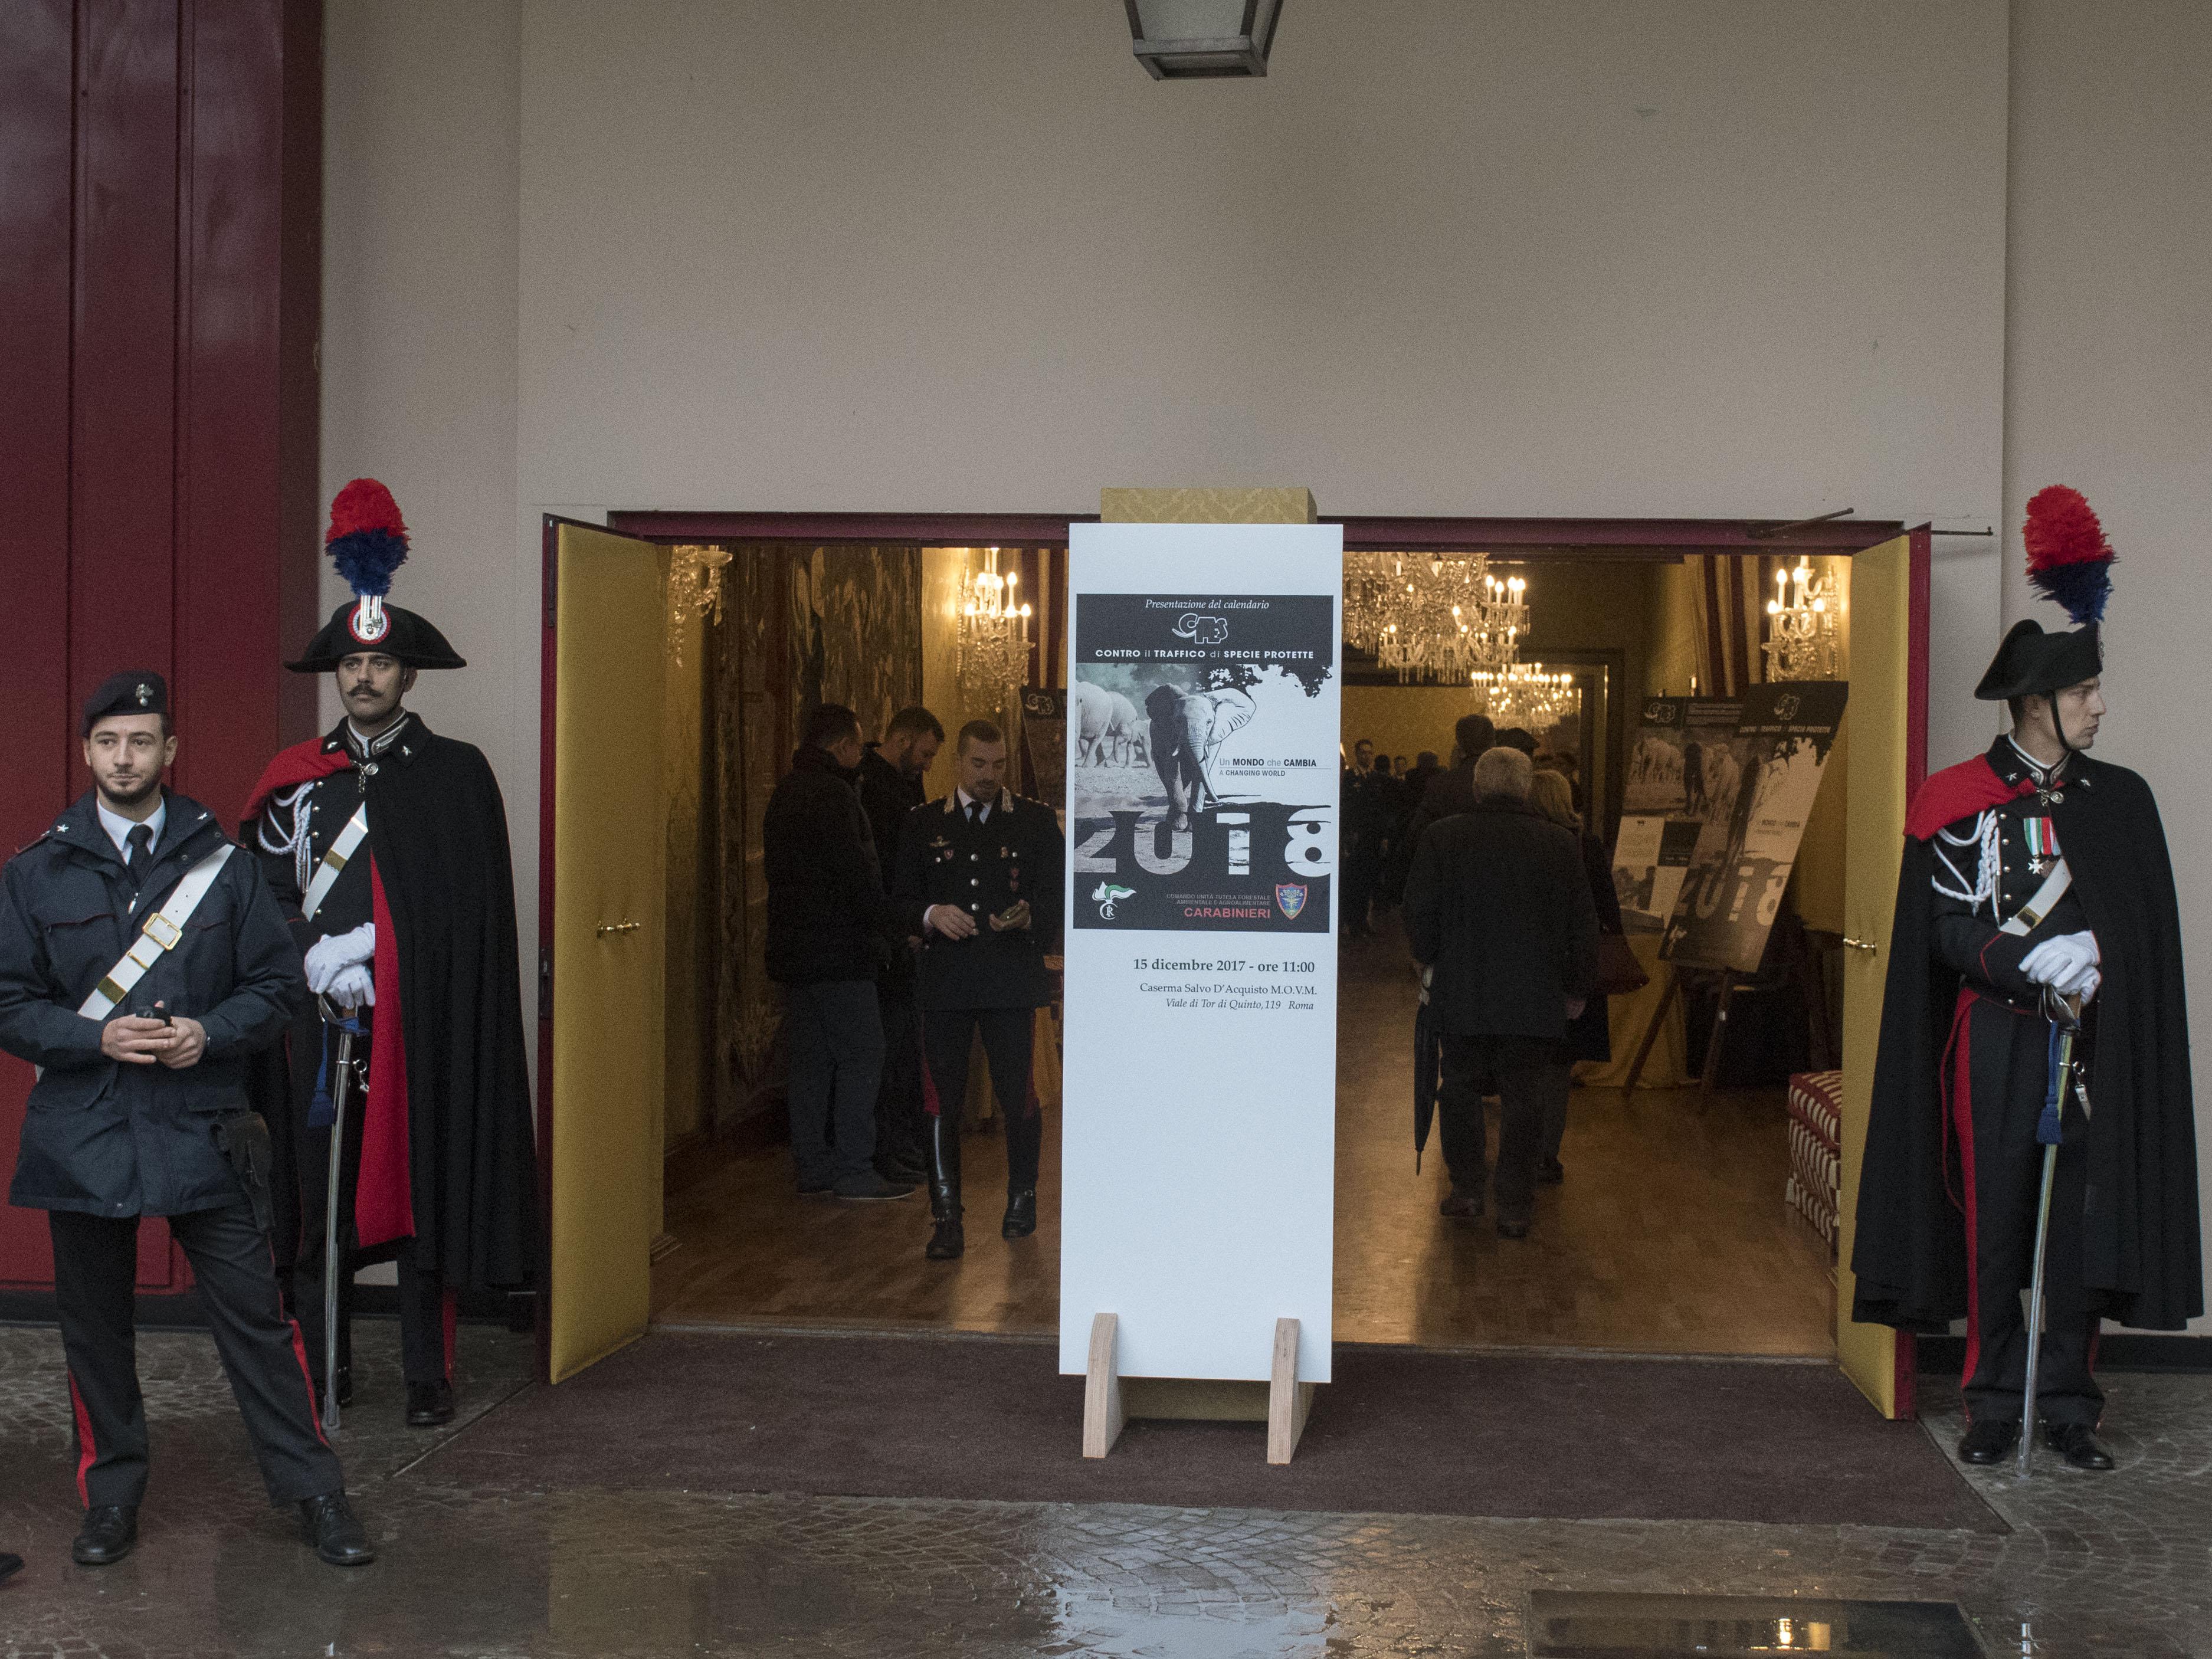 Calendario Carabinieri Dove Si Compra.Calendario Cites 2018 Www Gabrieleferramola It